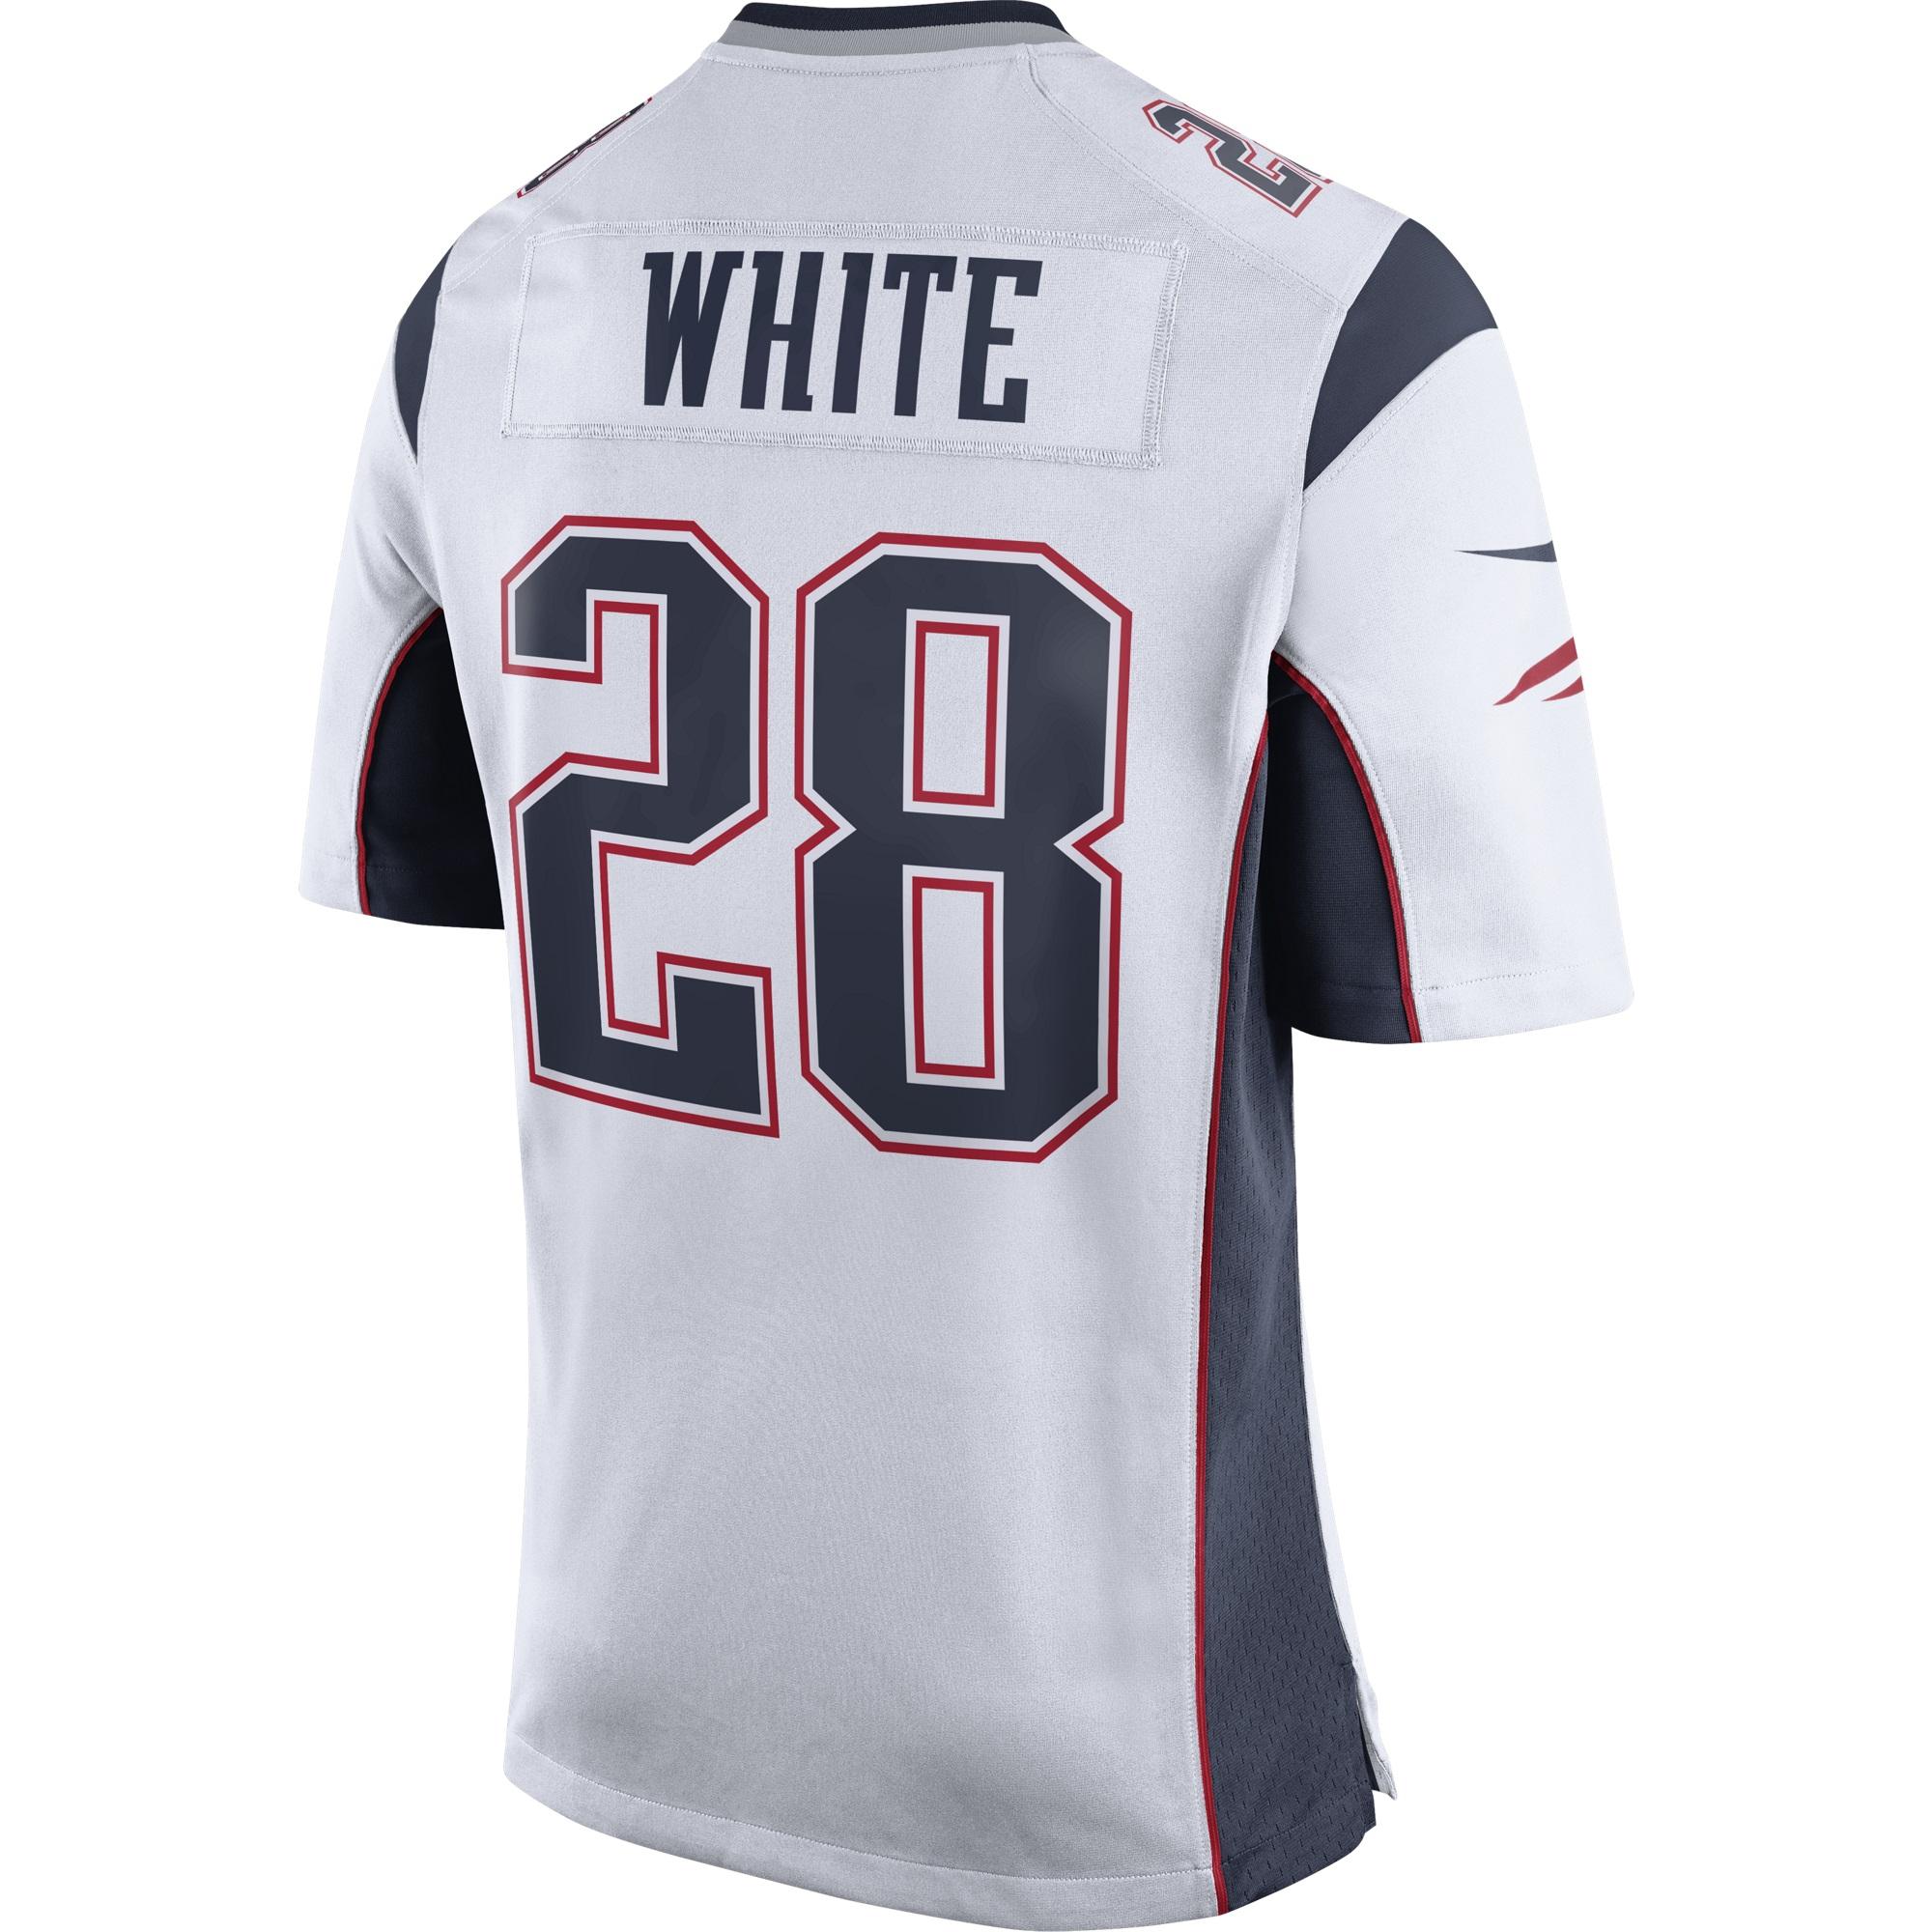 timeless design b31bf 72499 Nike James White #28 Game Jersey-White - Patriots ProShop